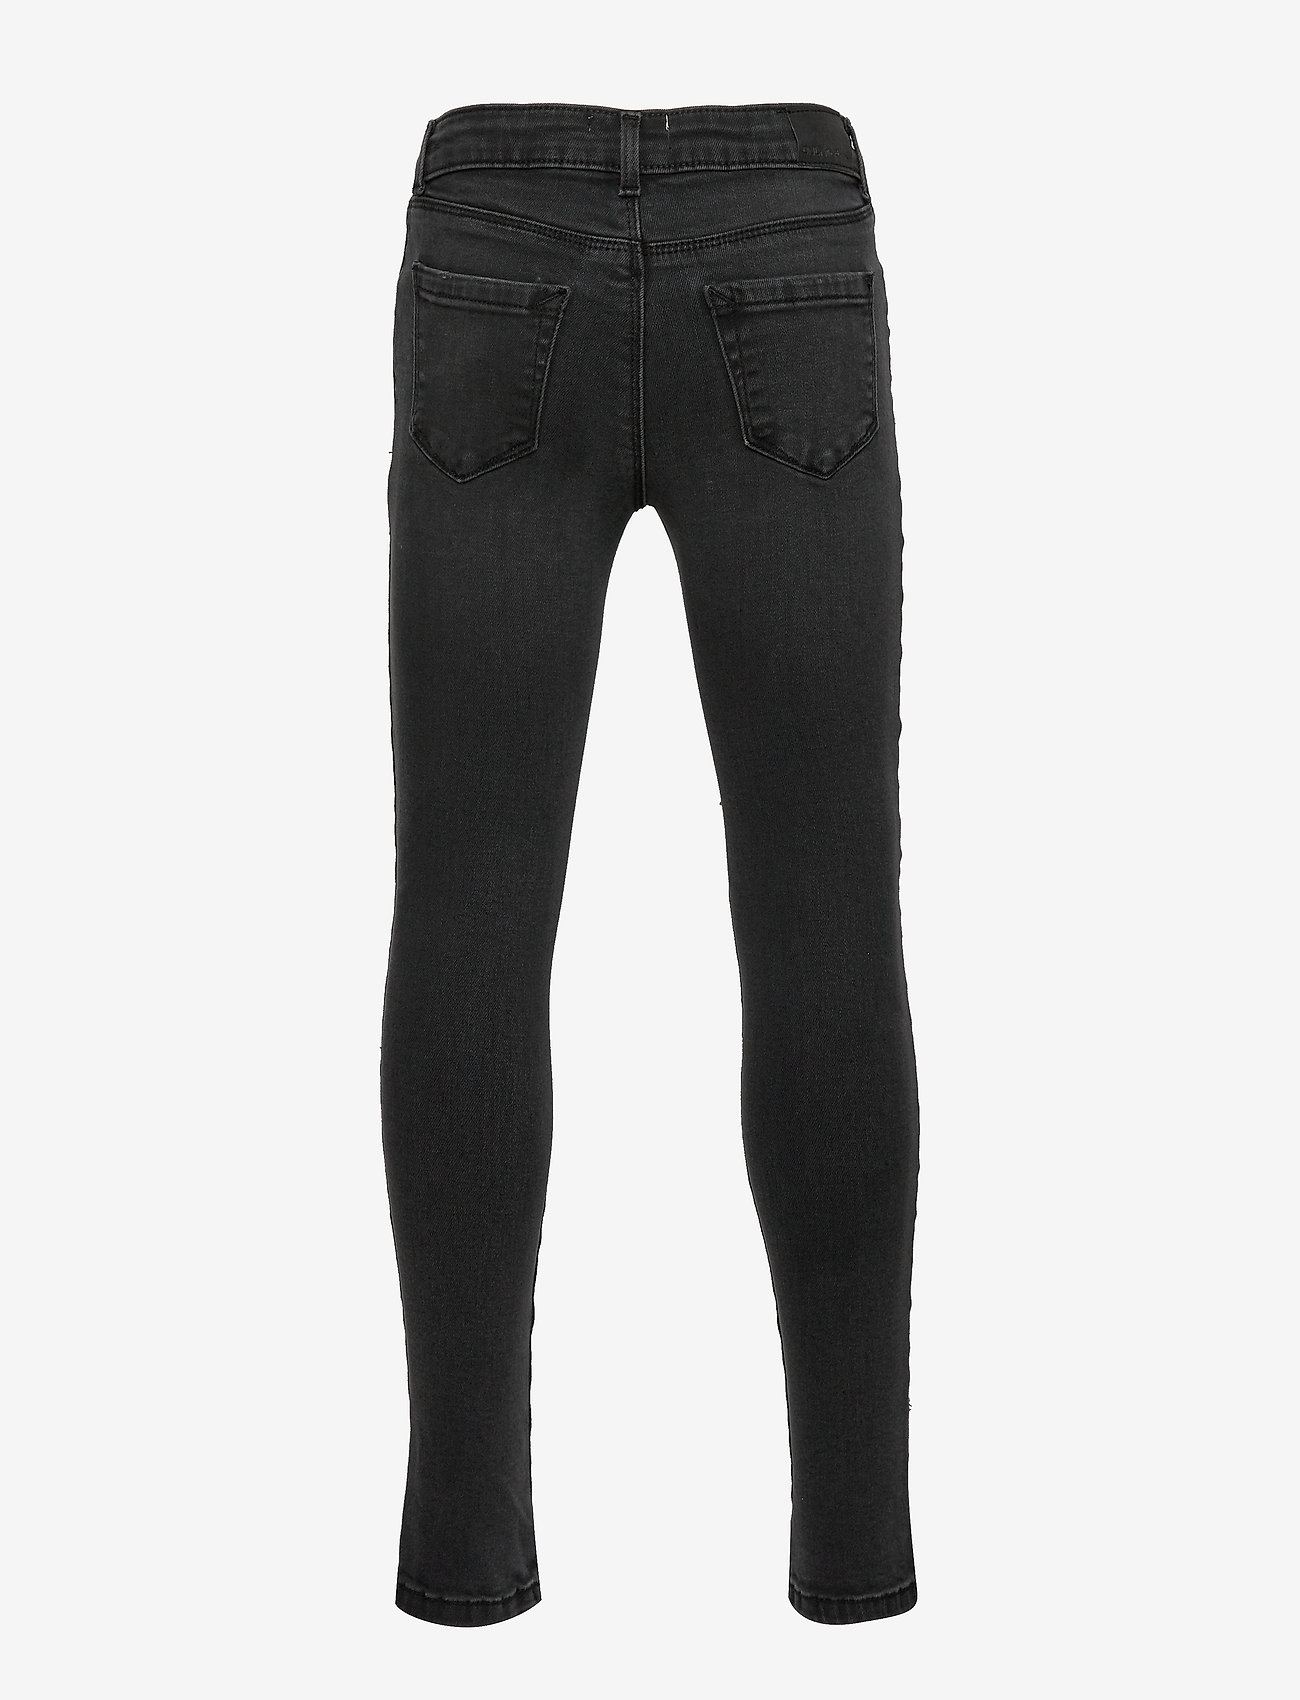 Kids Only - KONRACHEL BLACK DNM JEANS NOOS - jeans - black denim - 1